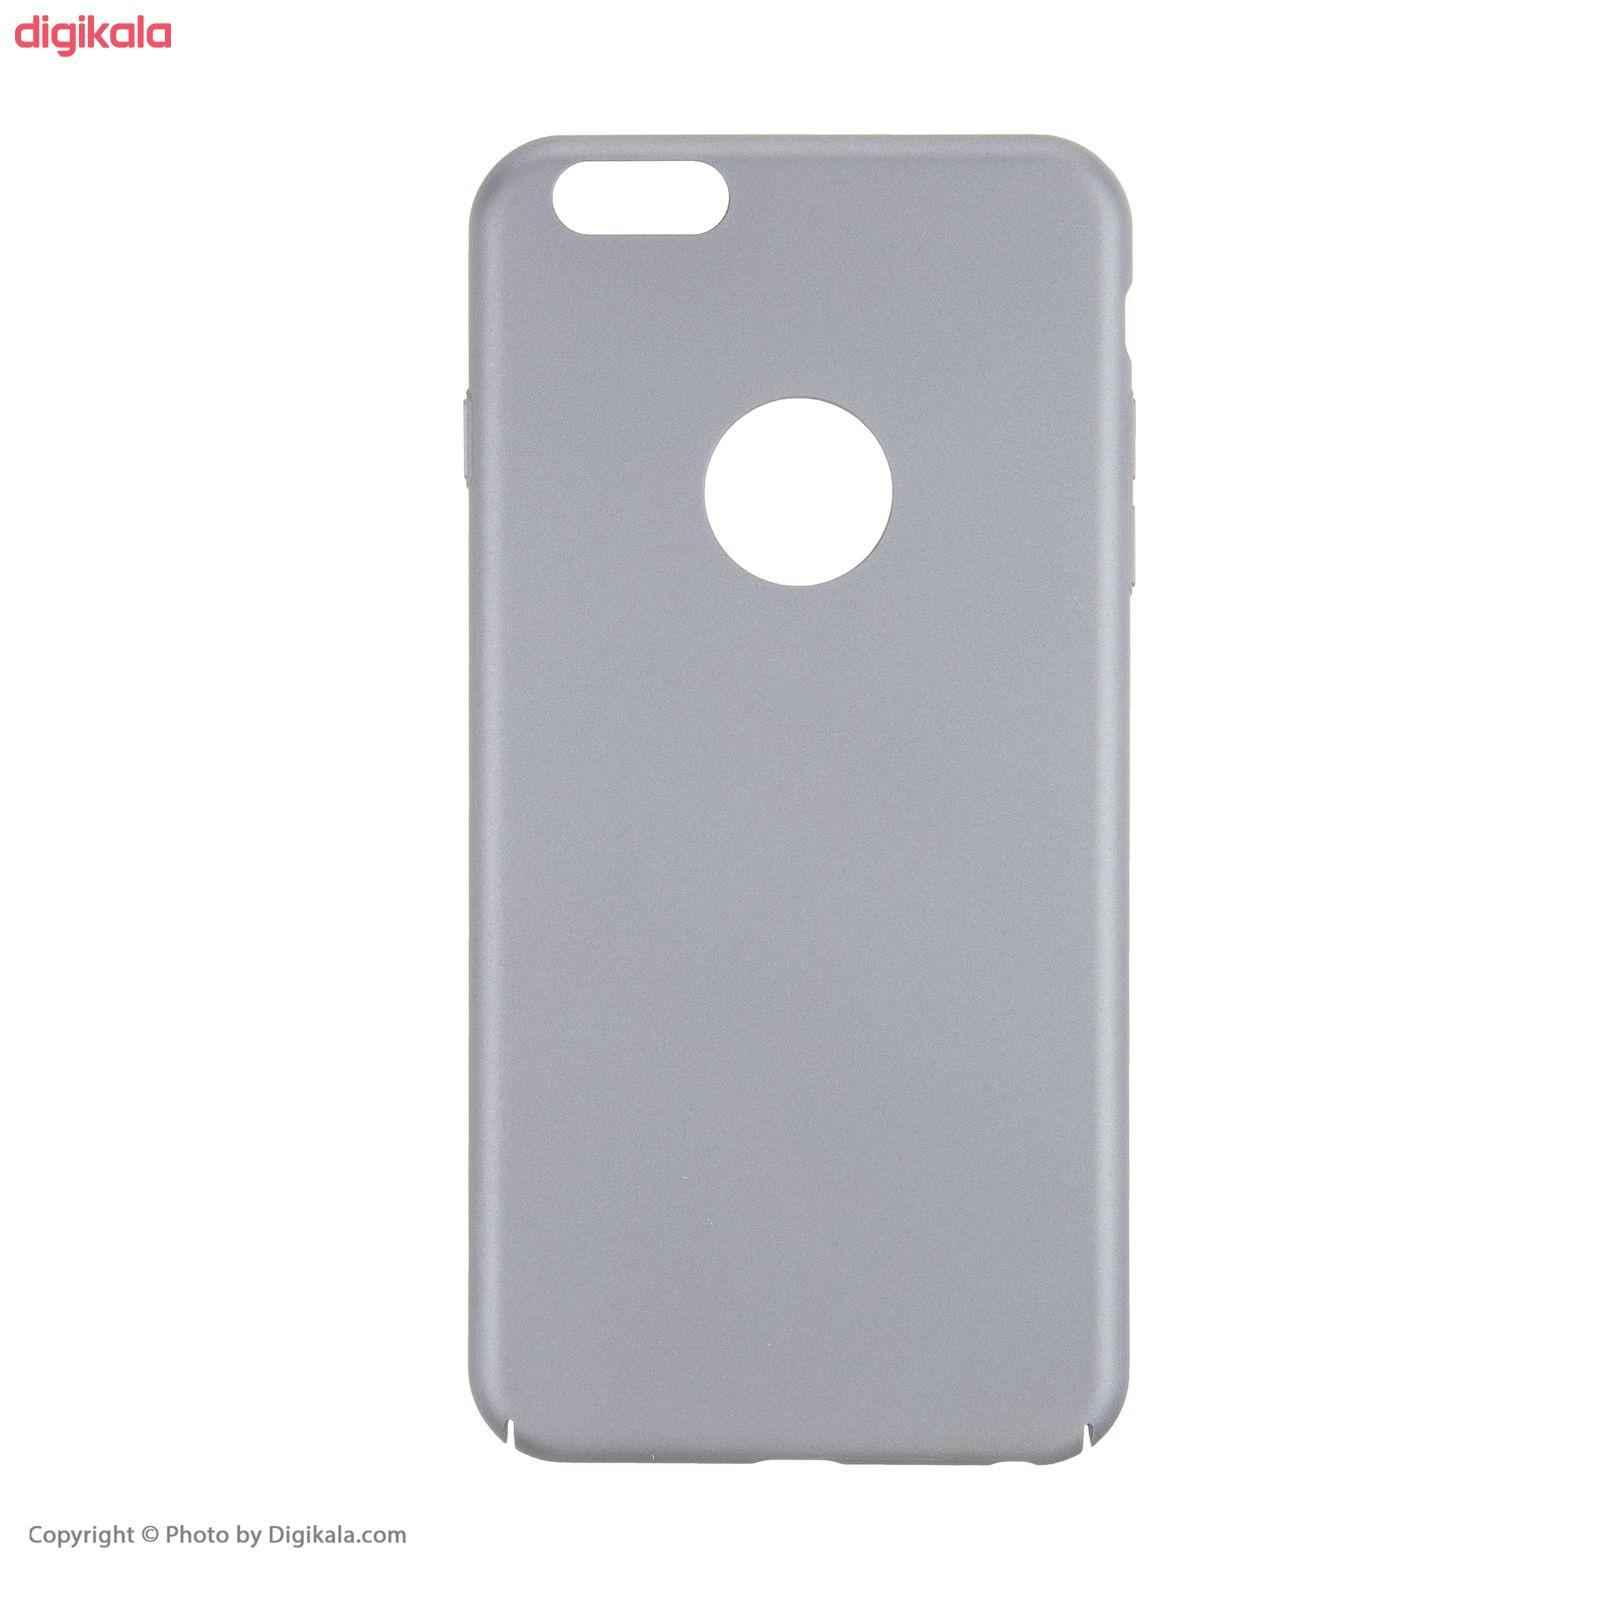 کاور جوی روم مدل JR-BP157 مناسب برای گوشی موبایل اپل iPhone 6 plus/6s plus  main 1 7